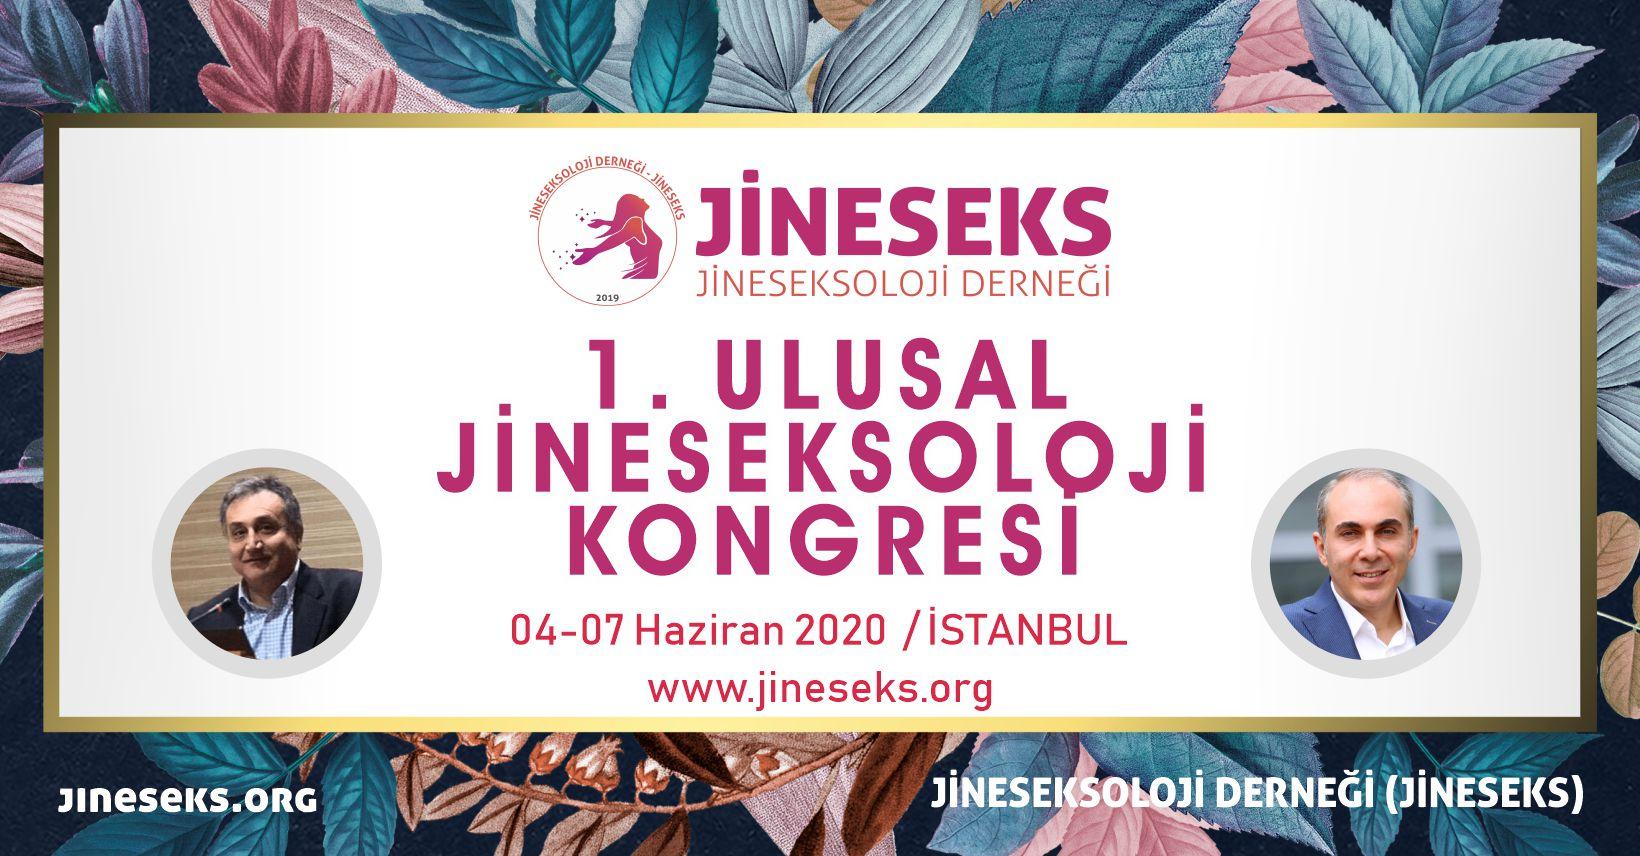 1. Ulusal Jineseksoloji Kongresi